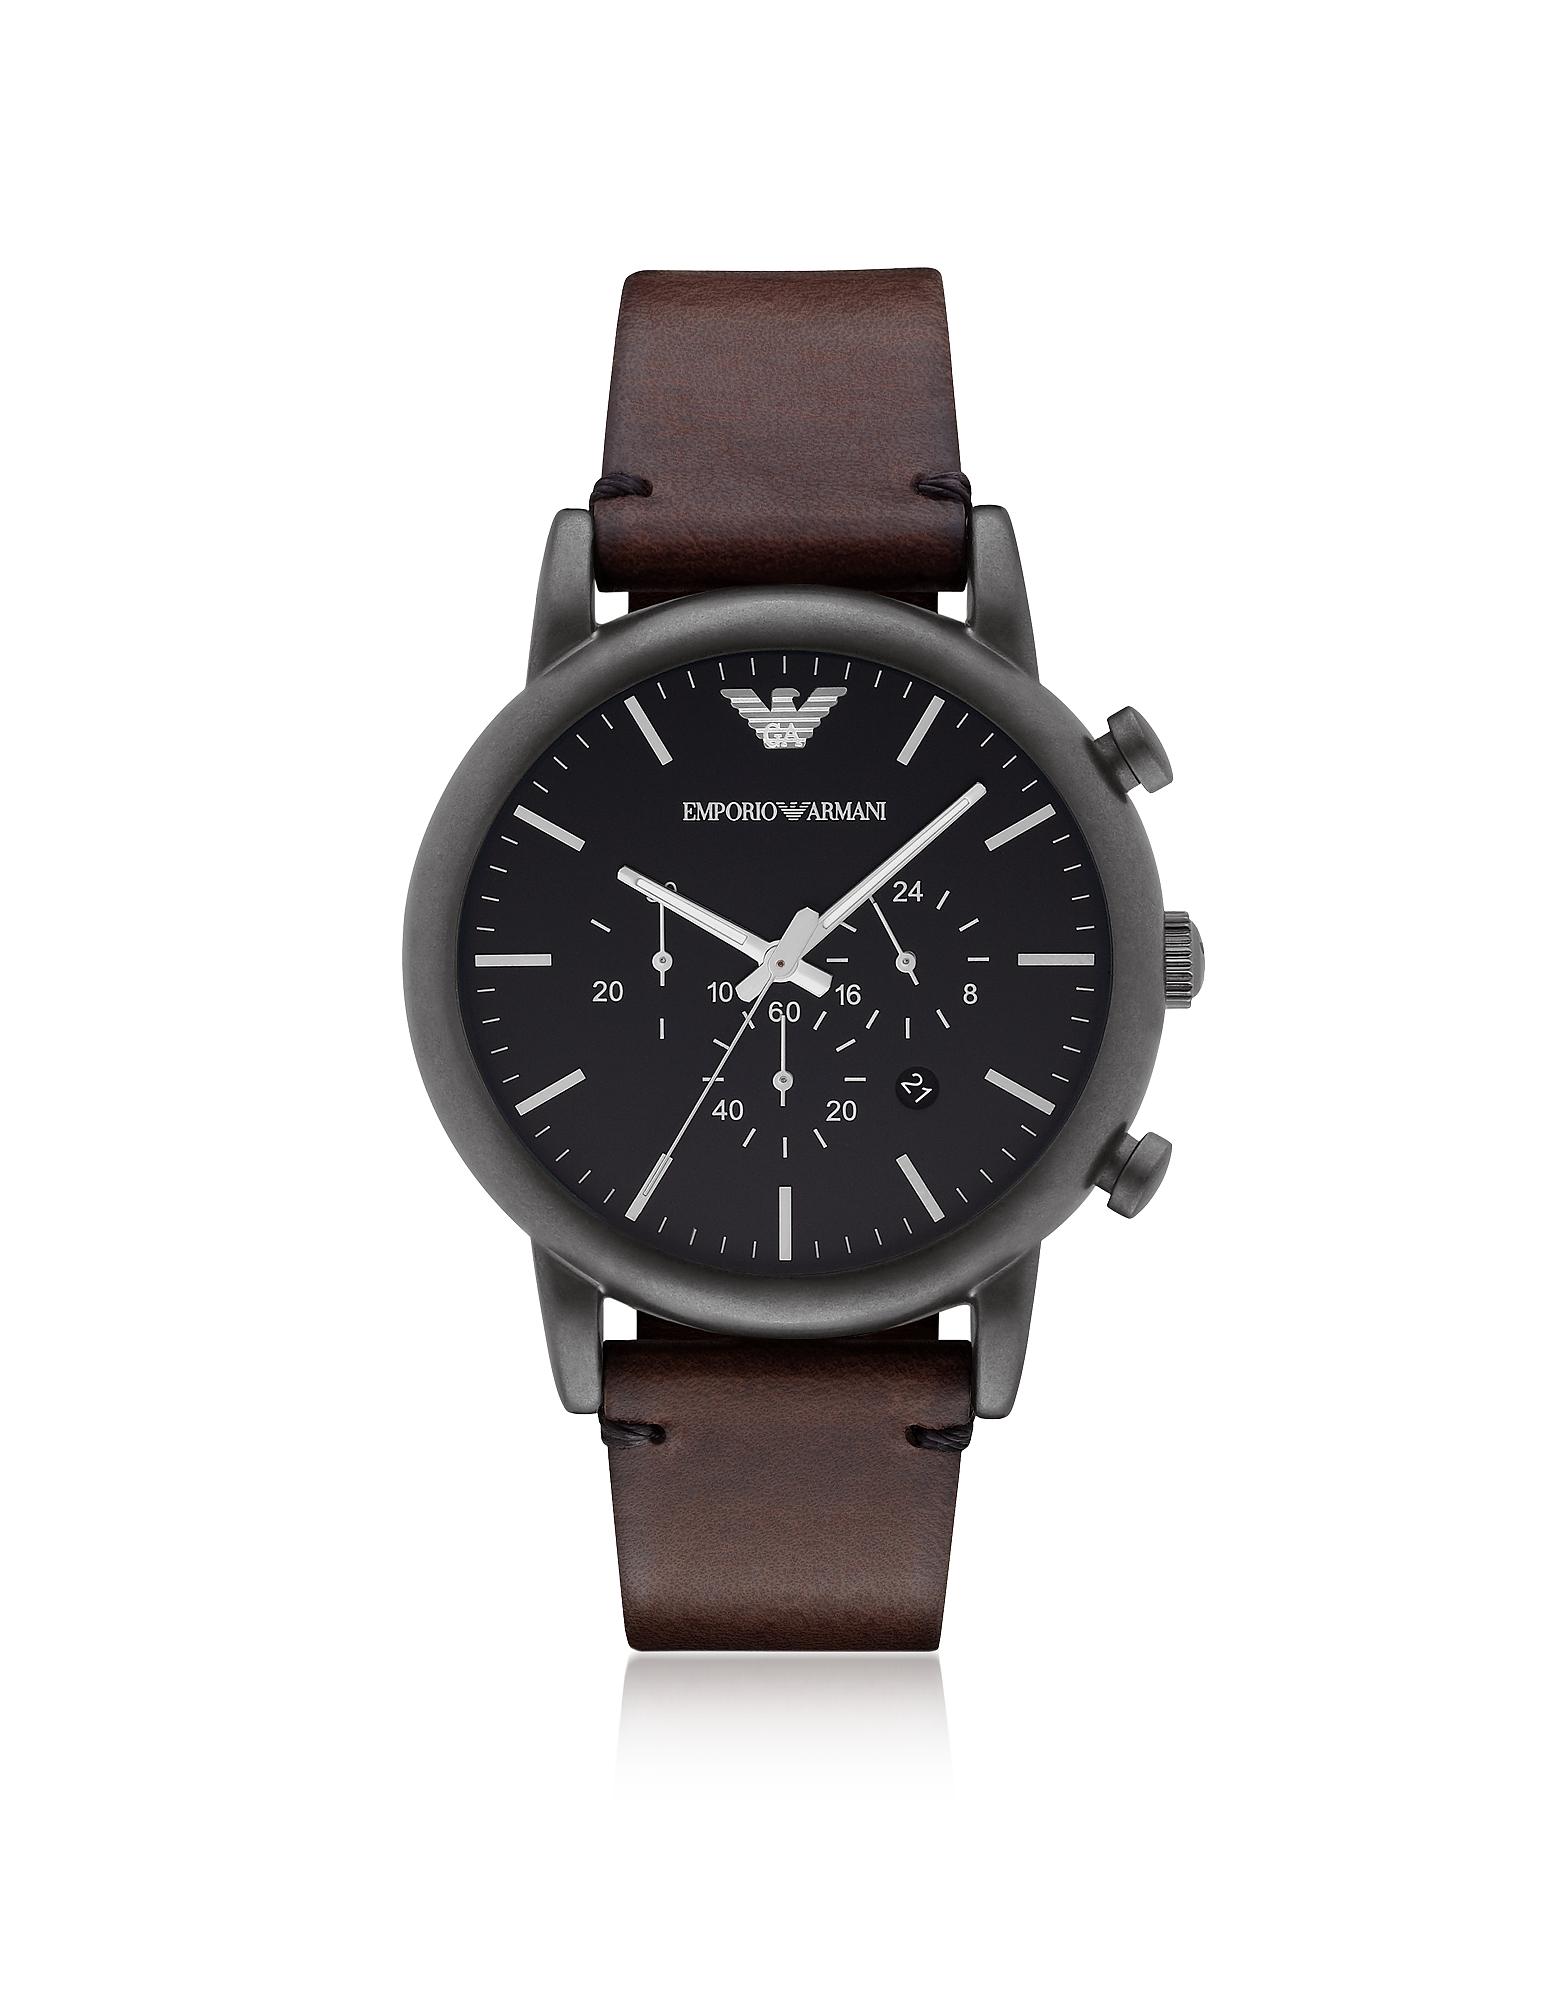 Emporio Armani Men's Watches, AR1919 Luigi Men's Watch